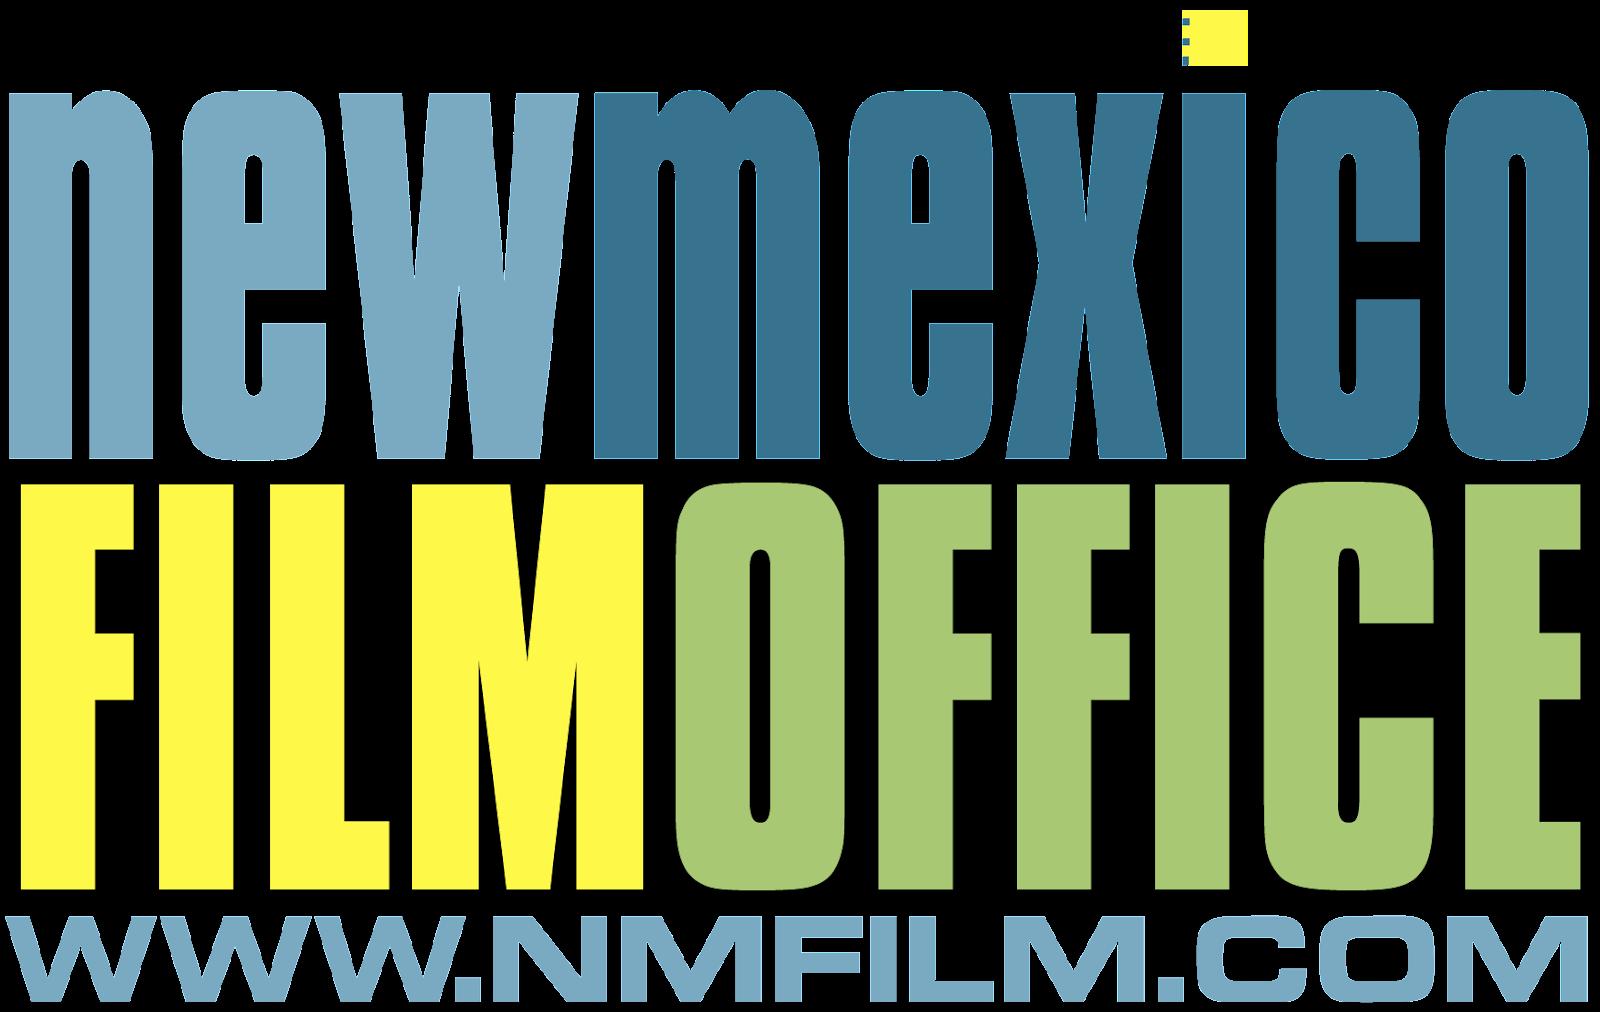 Studio O'Brady at New Mexico Film Office